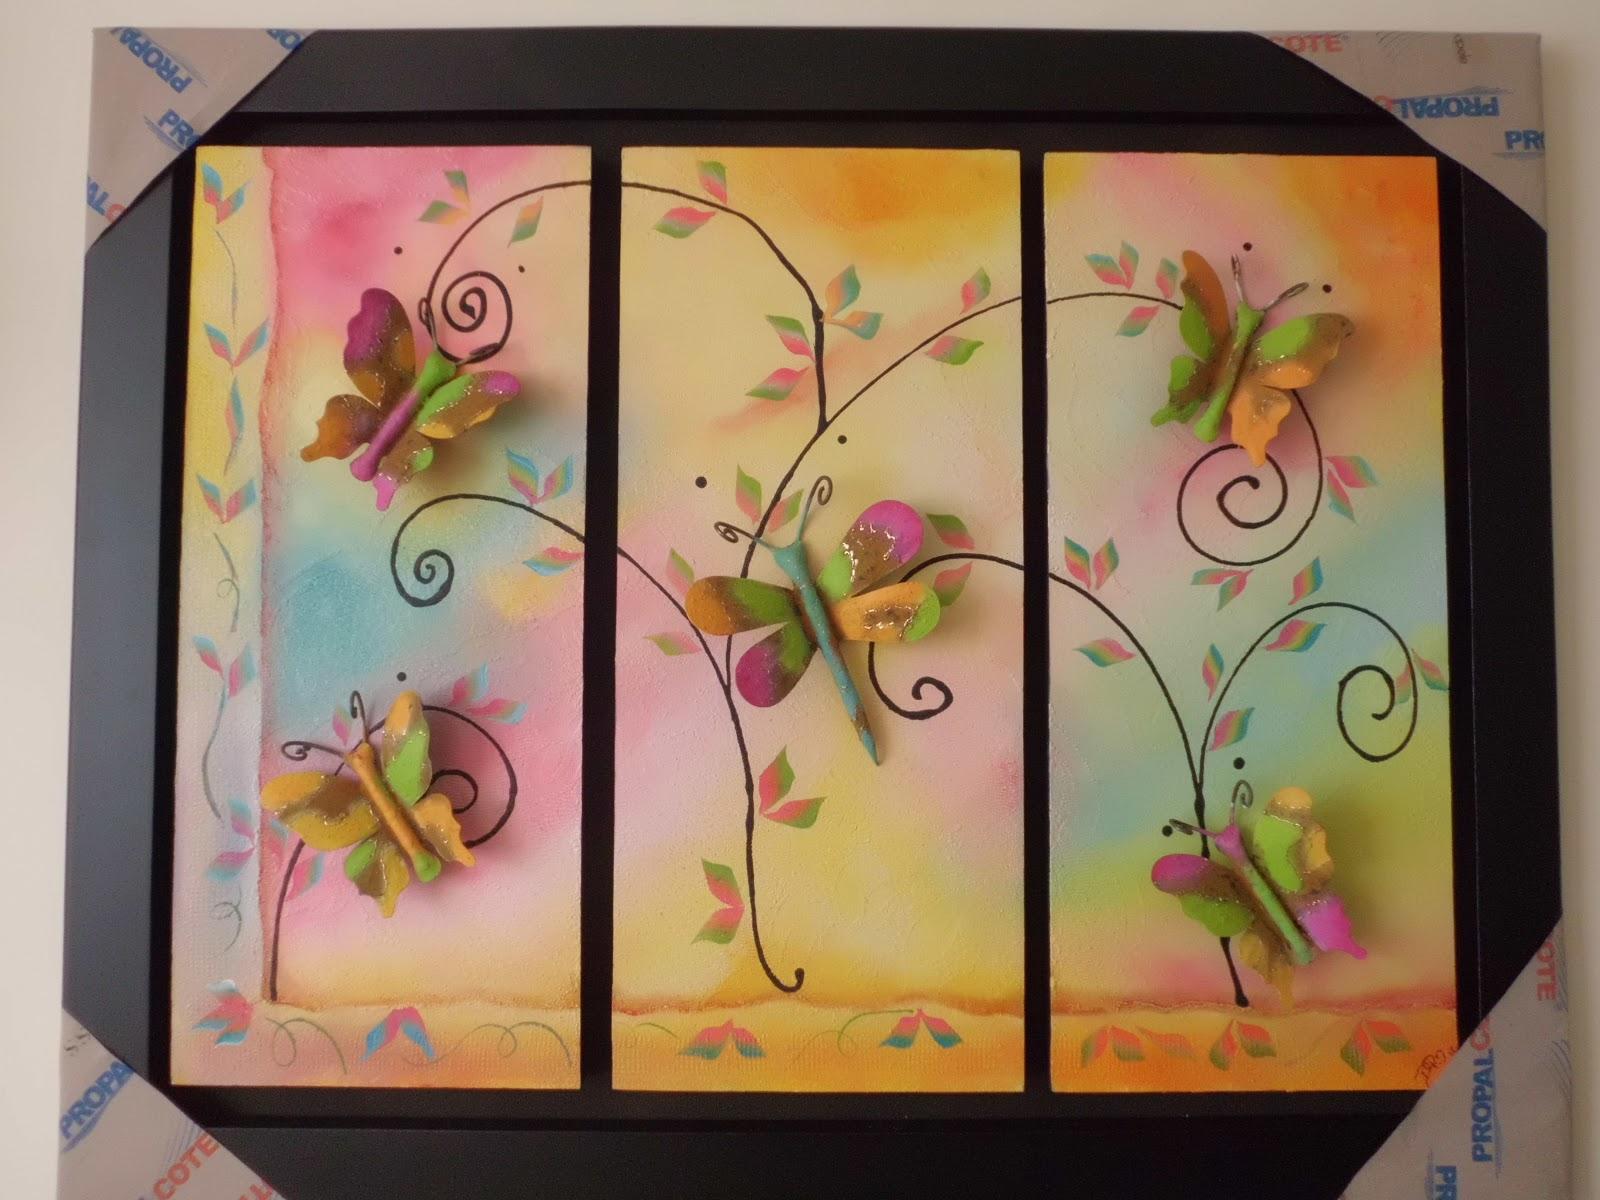 Manualidades cuadros decorativos - Manualidades faciles cuadros ...